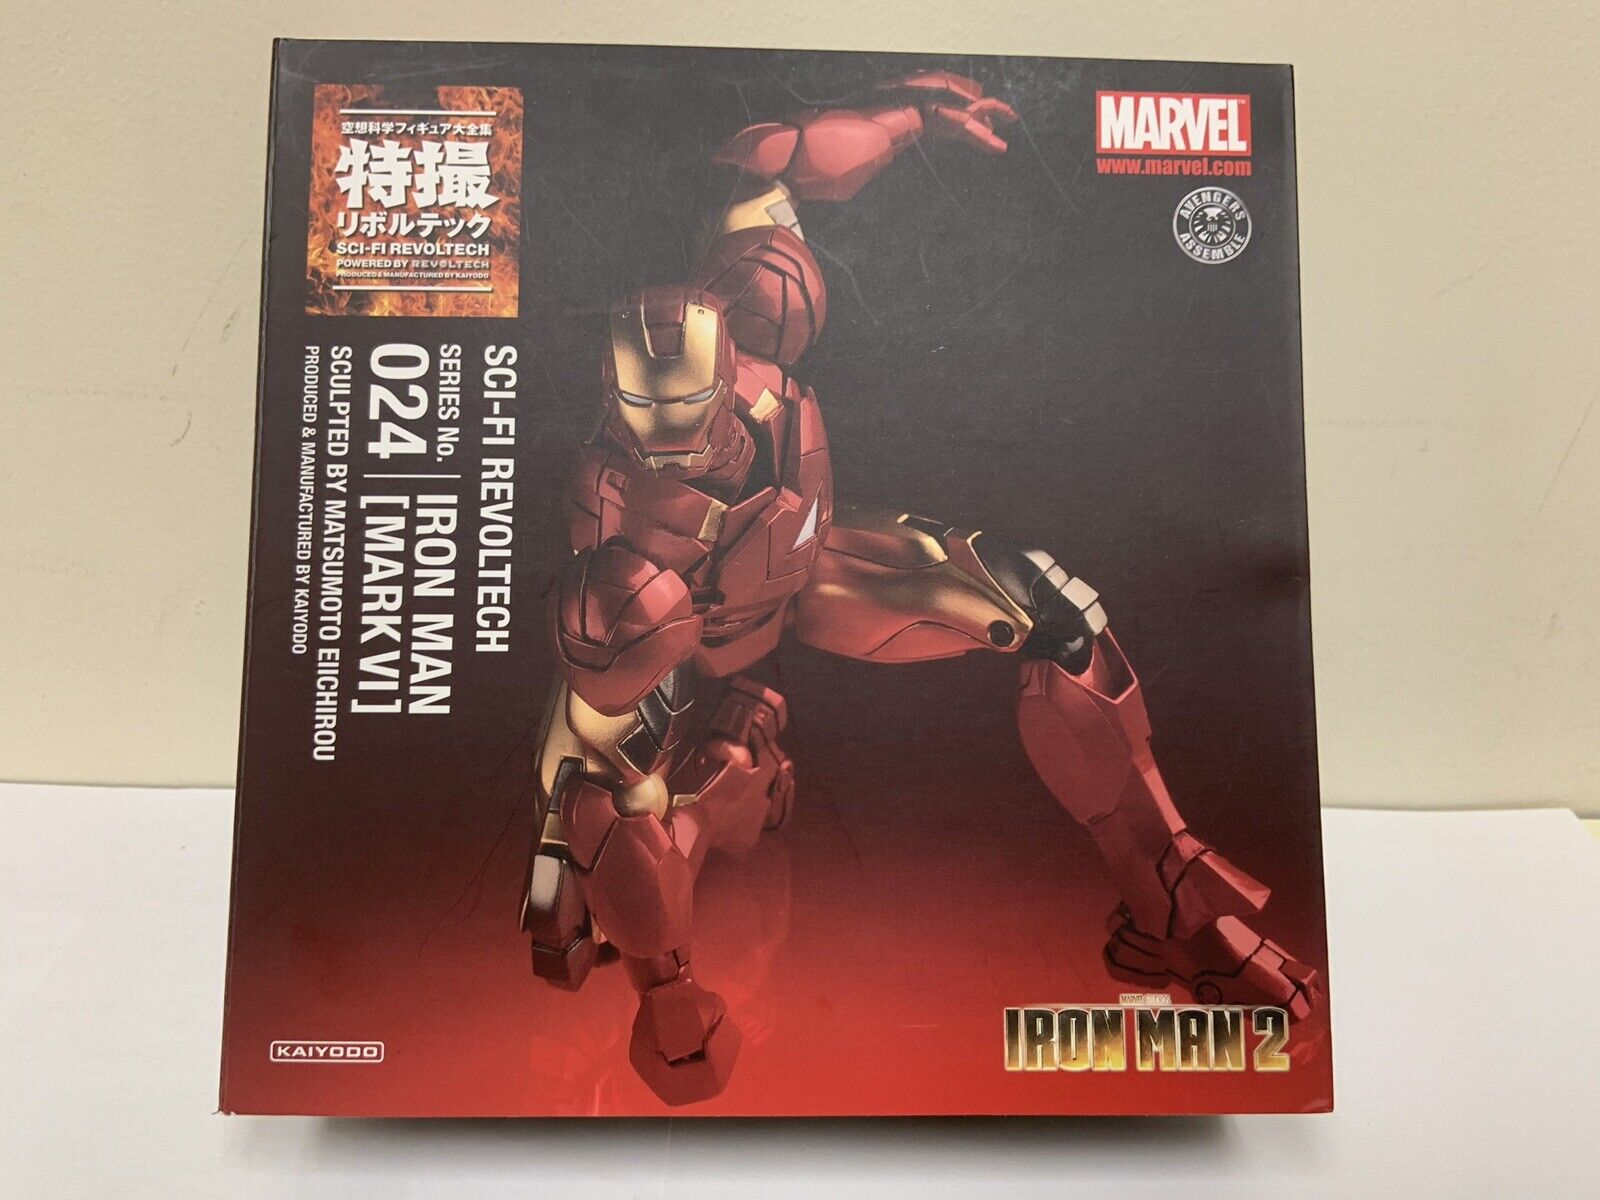 Marvel Sci-Fi Revoltech Iron Man Wirkung Figure  024